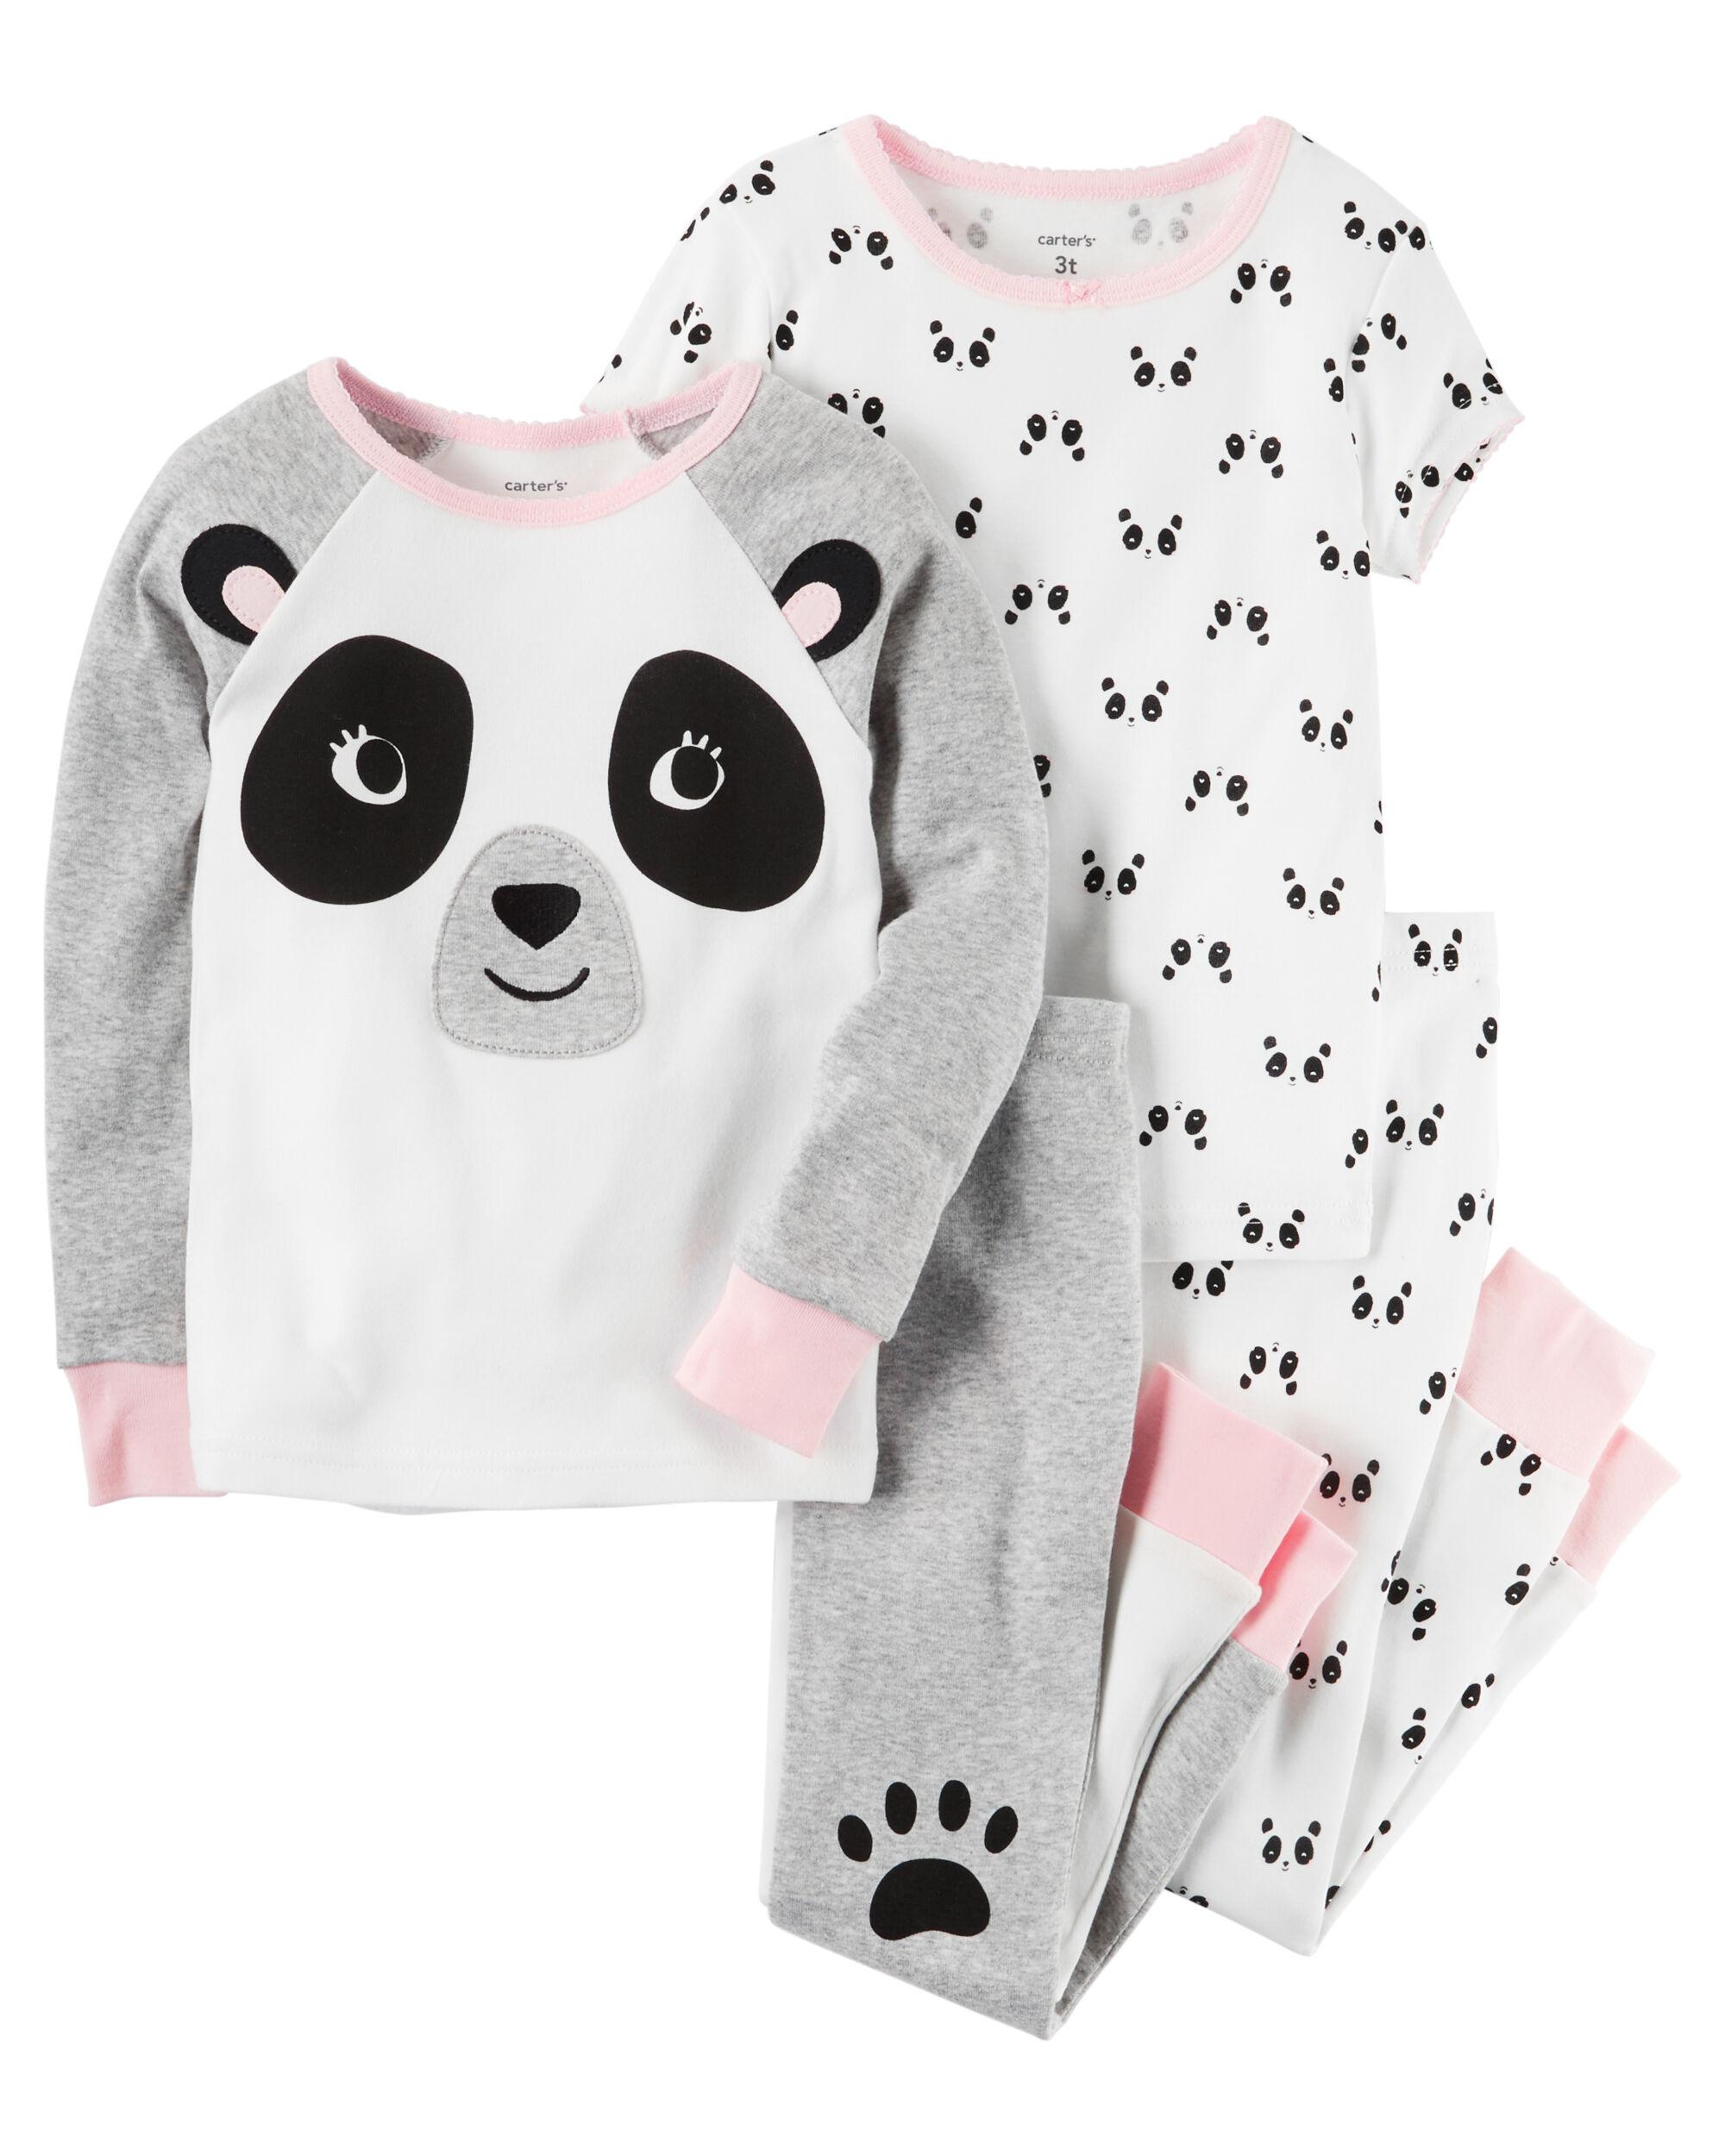 4 Piece Panda Snug Fit Cotton Pjs Carters Com